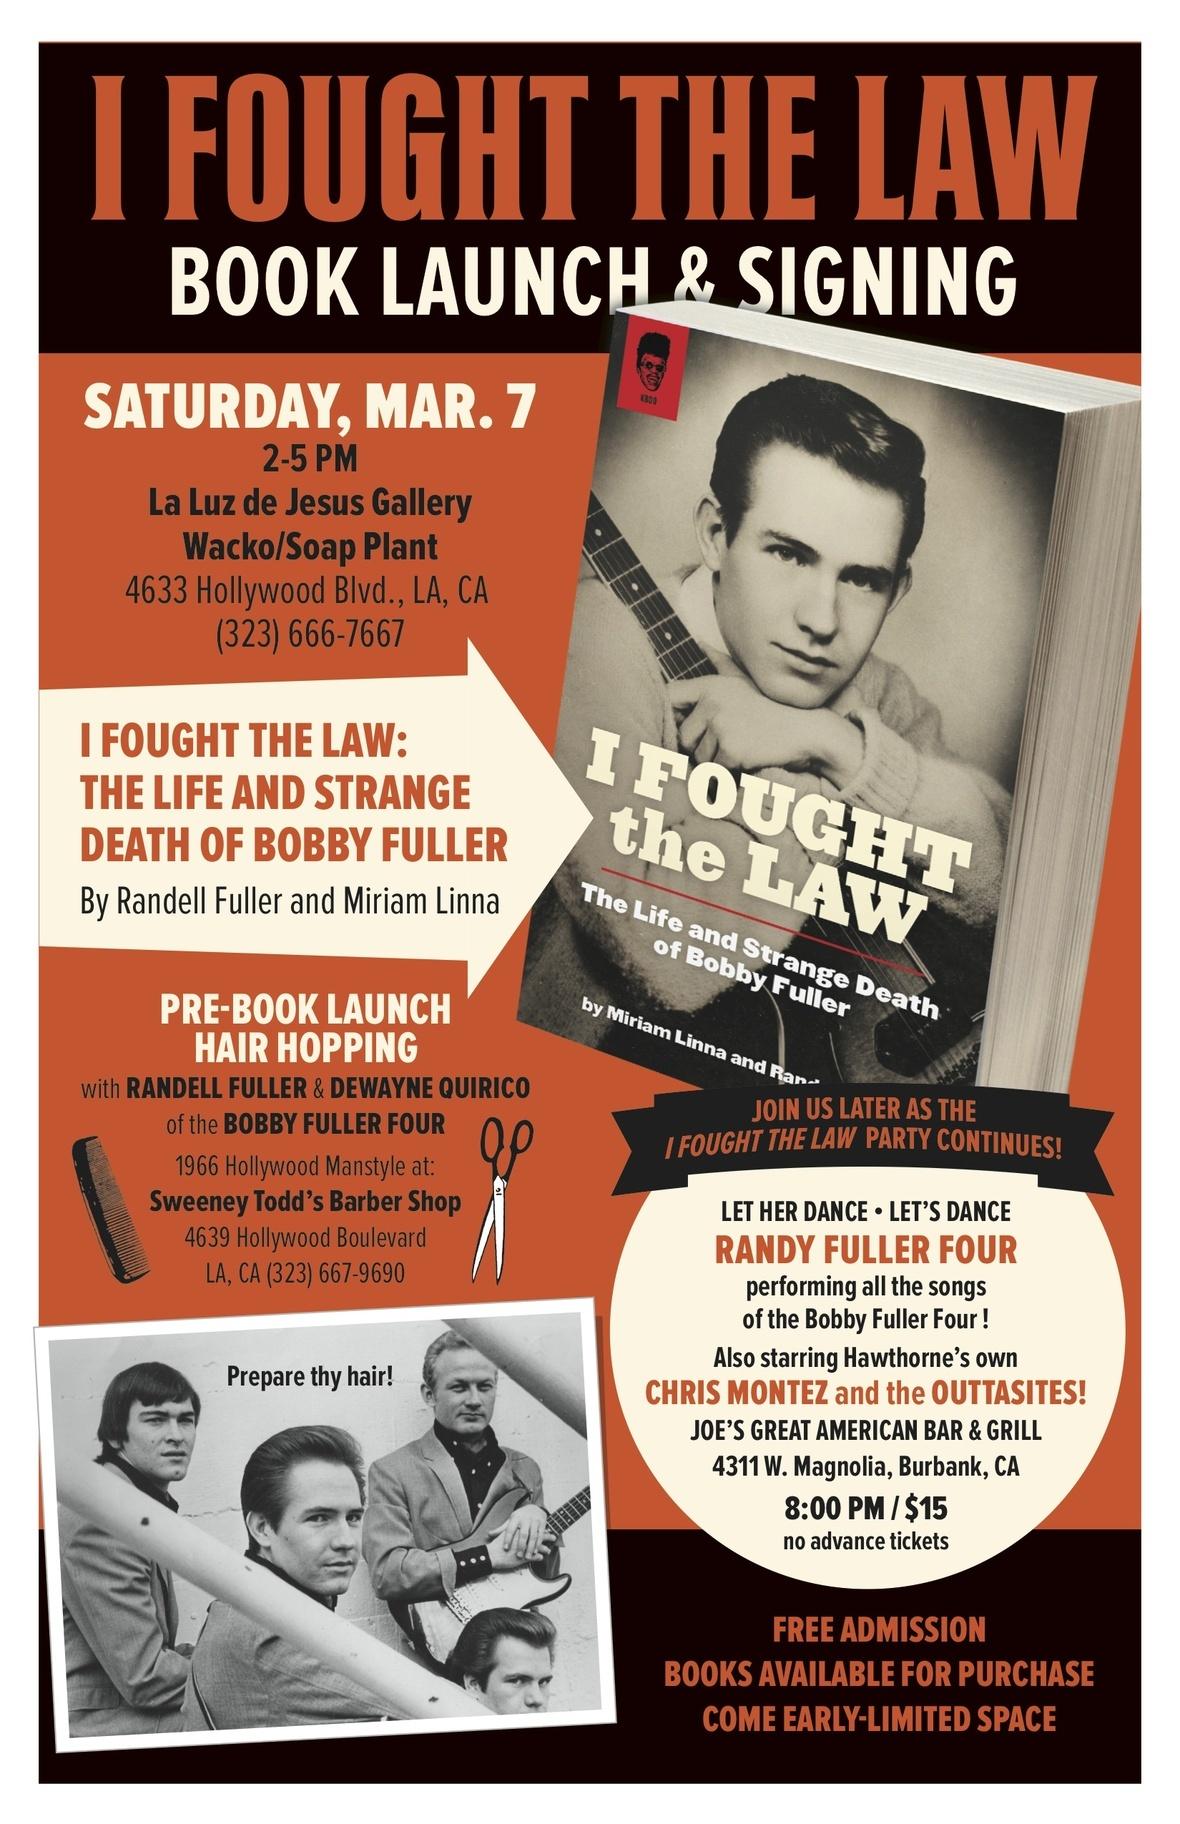 Fuller book launch poster